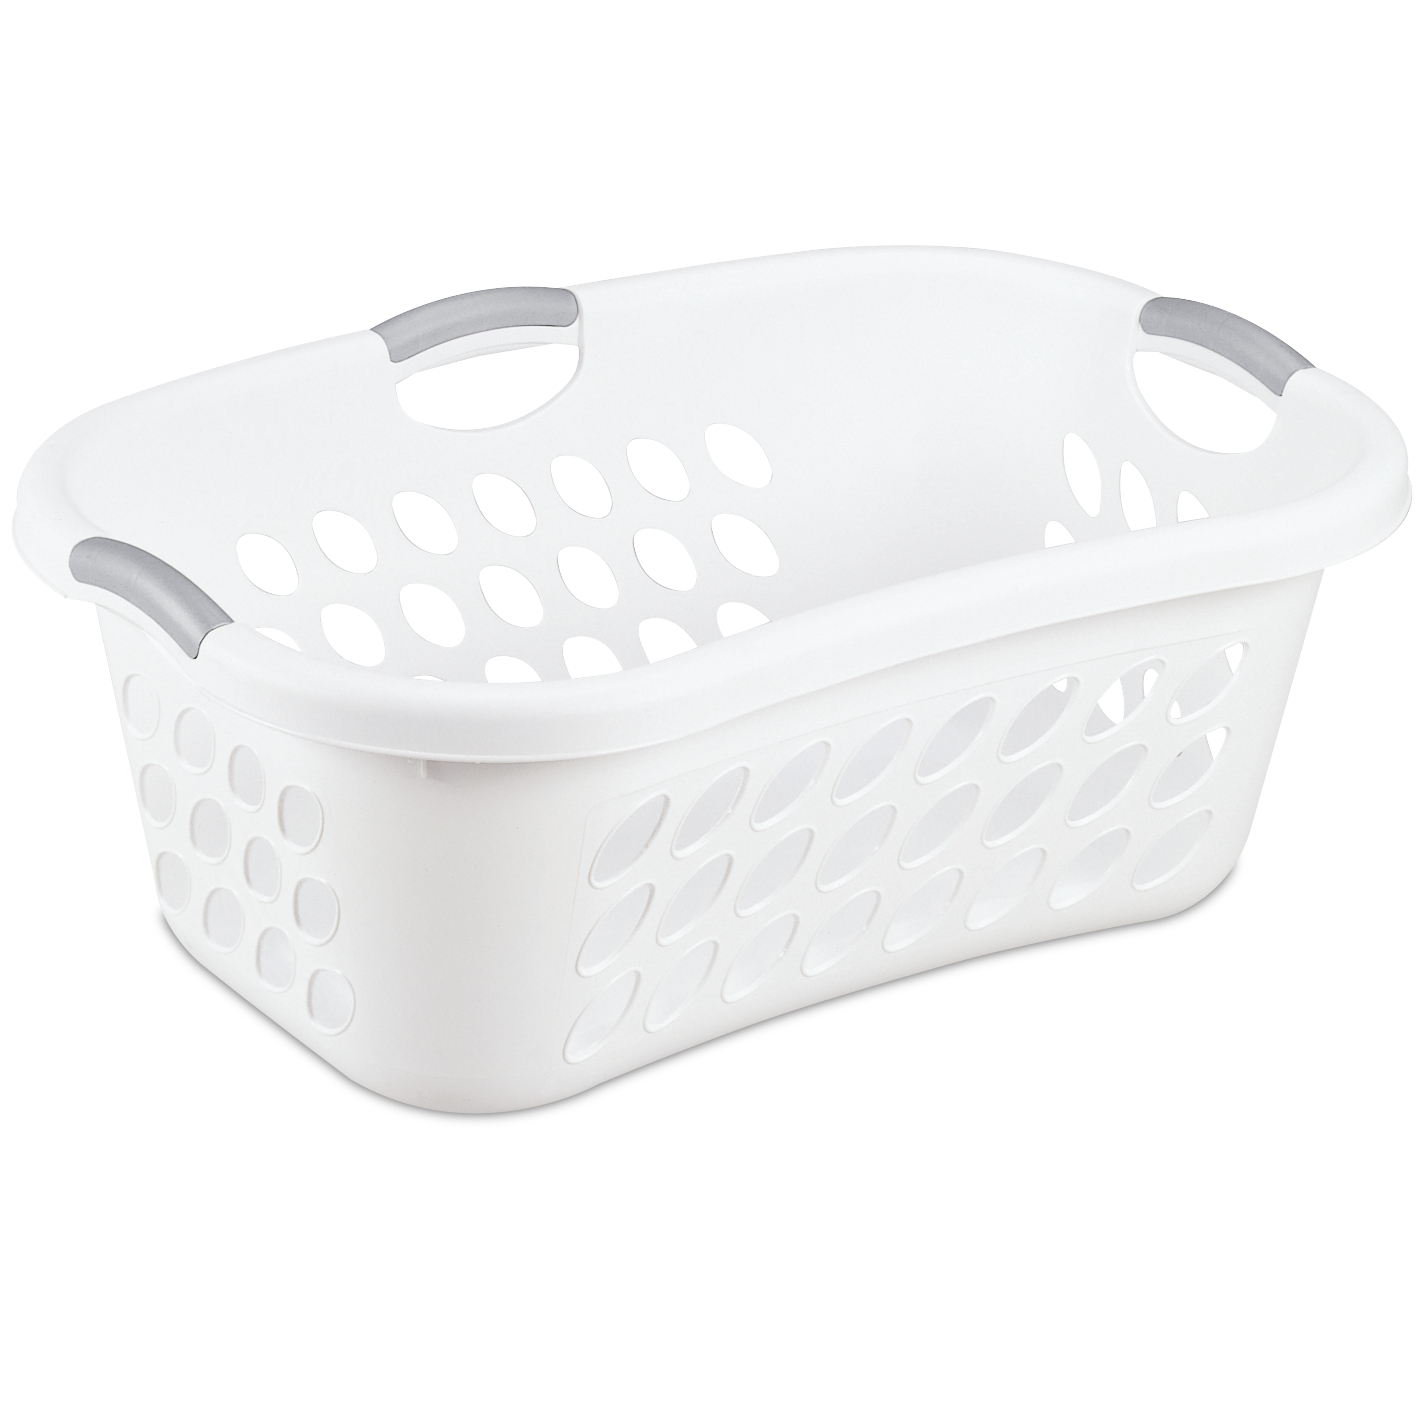 Sterilite 1.25 Bushel/44 L Ultra™ HipHold Laundry Basket, White